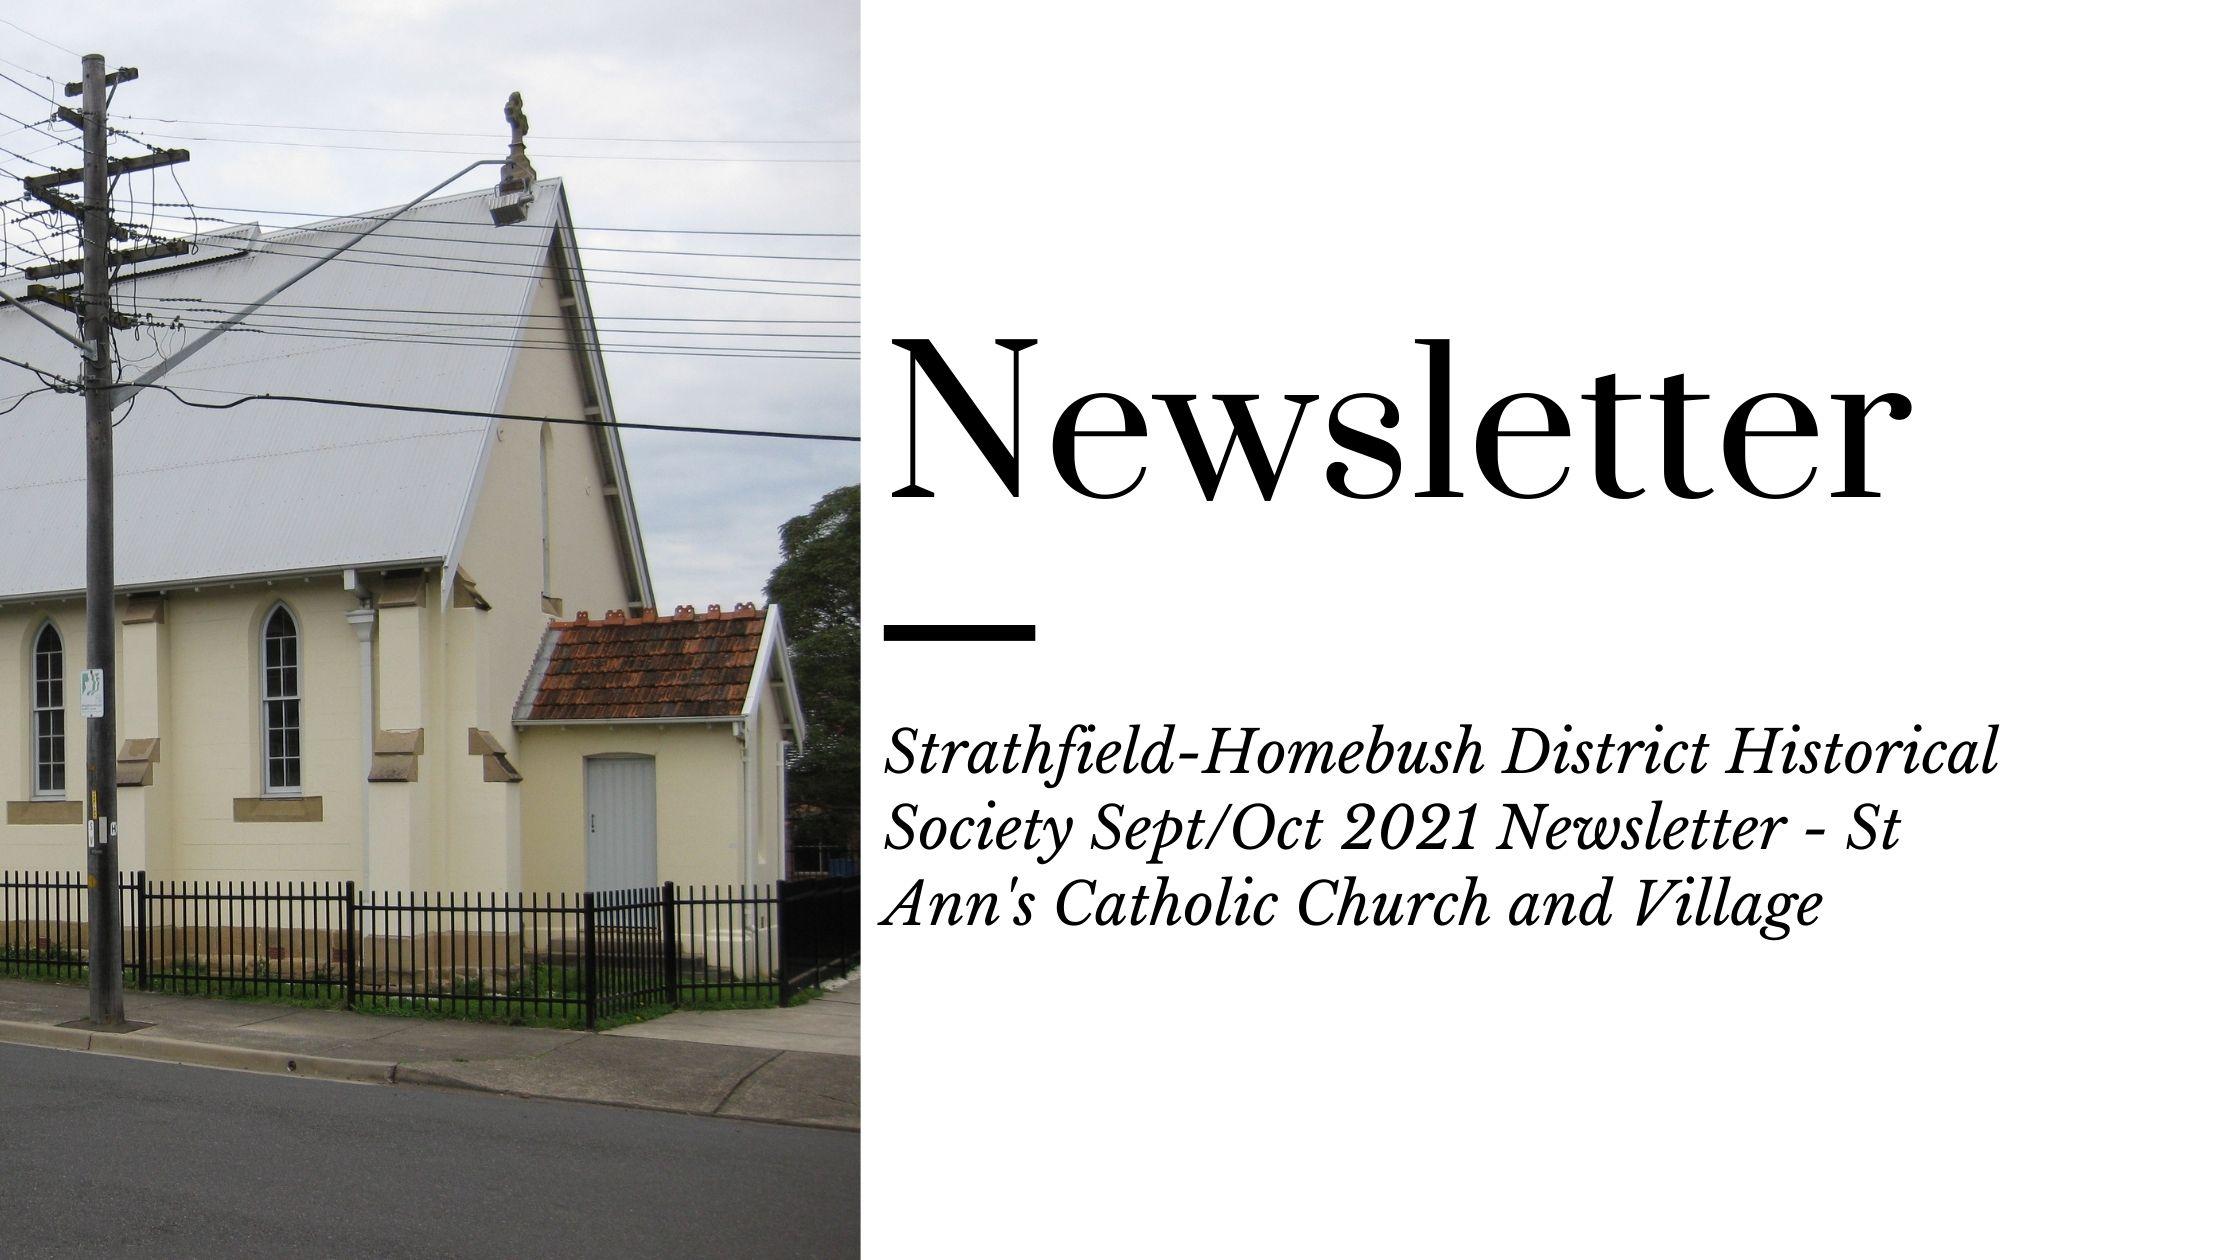 St Anne's Catholic Church and Village